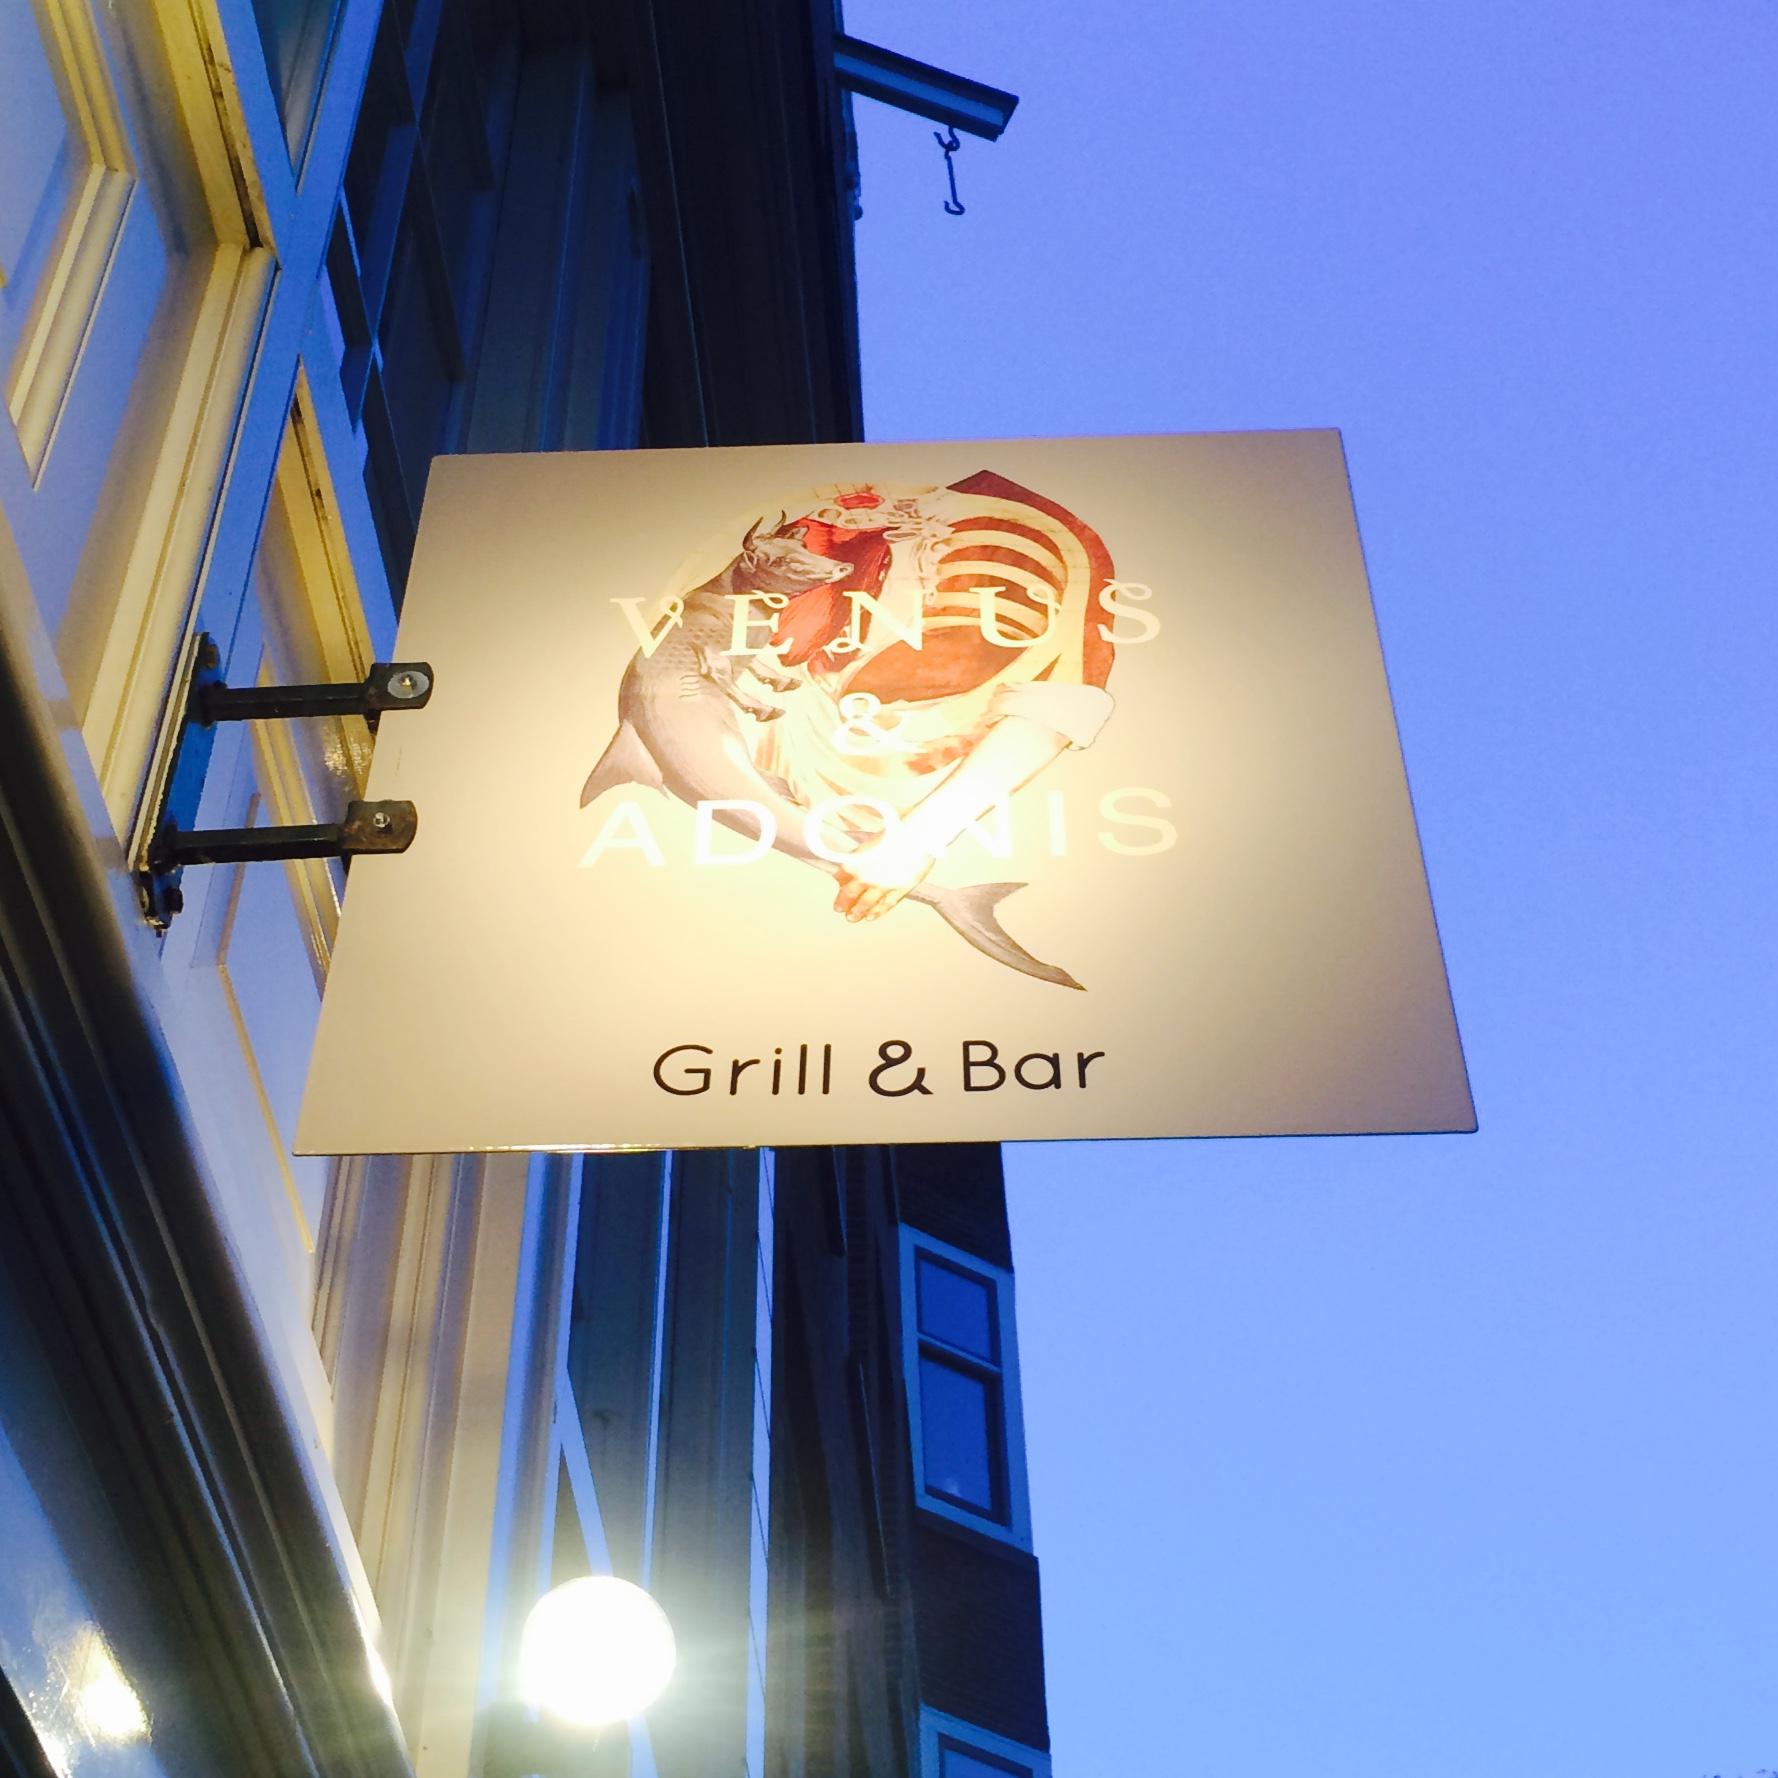 Venus Adonis restaurant Catch52 Prinsengracht